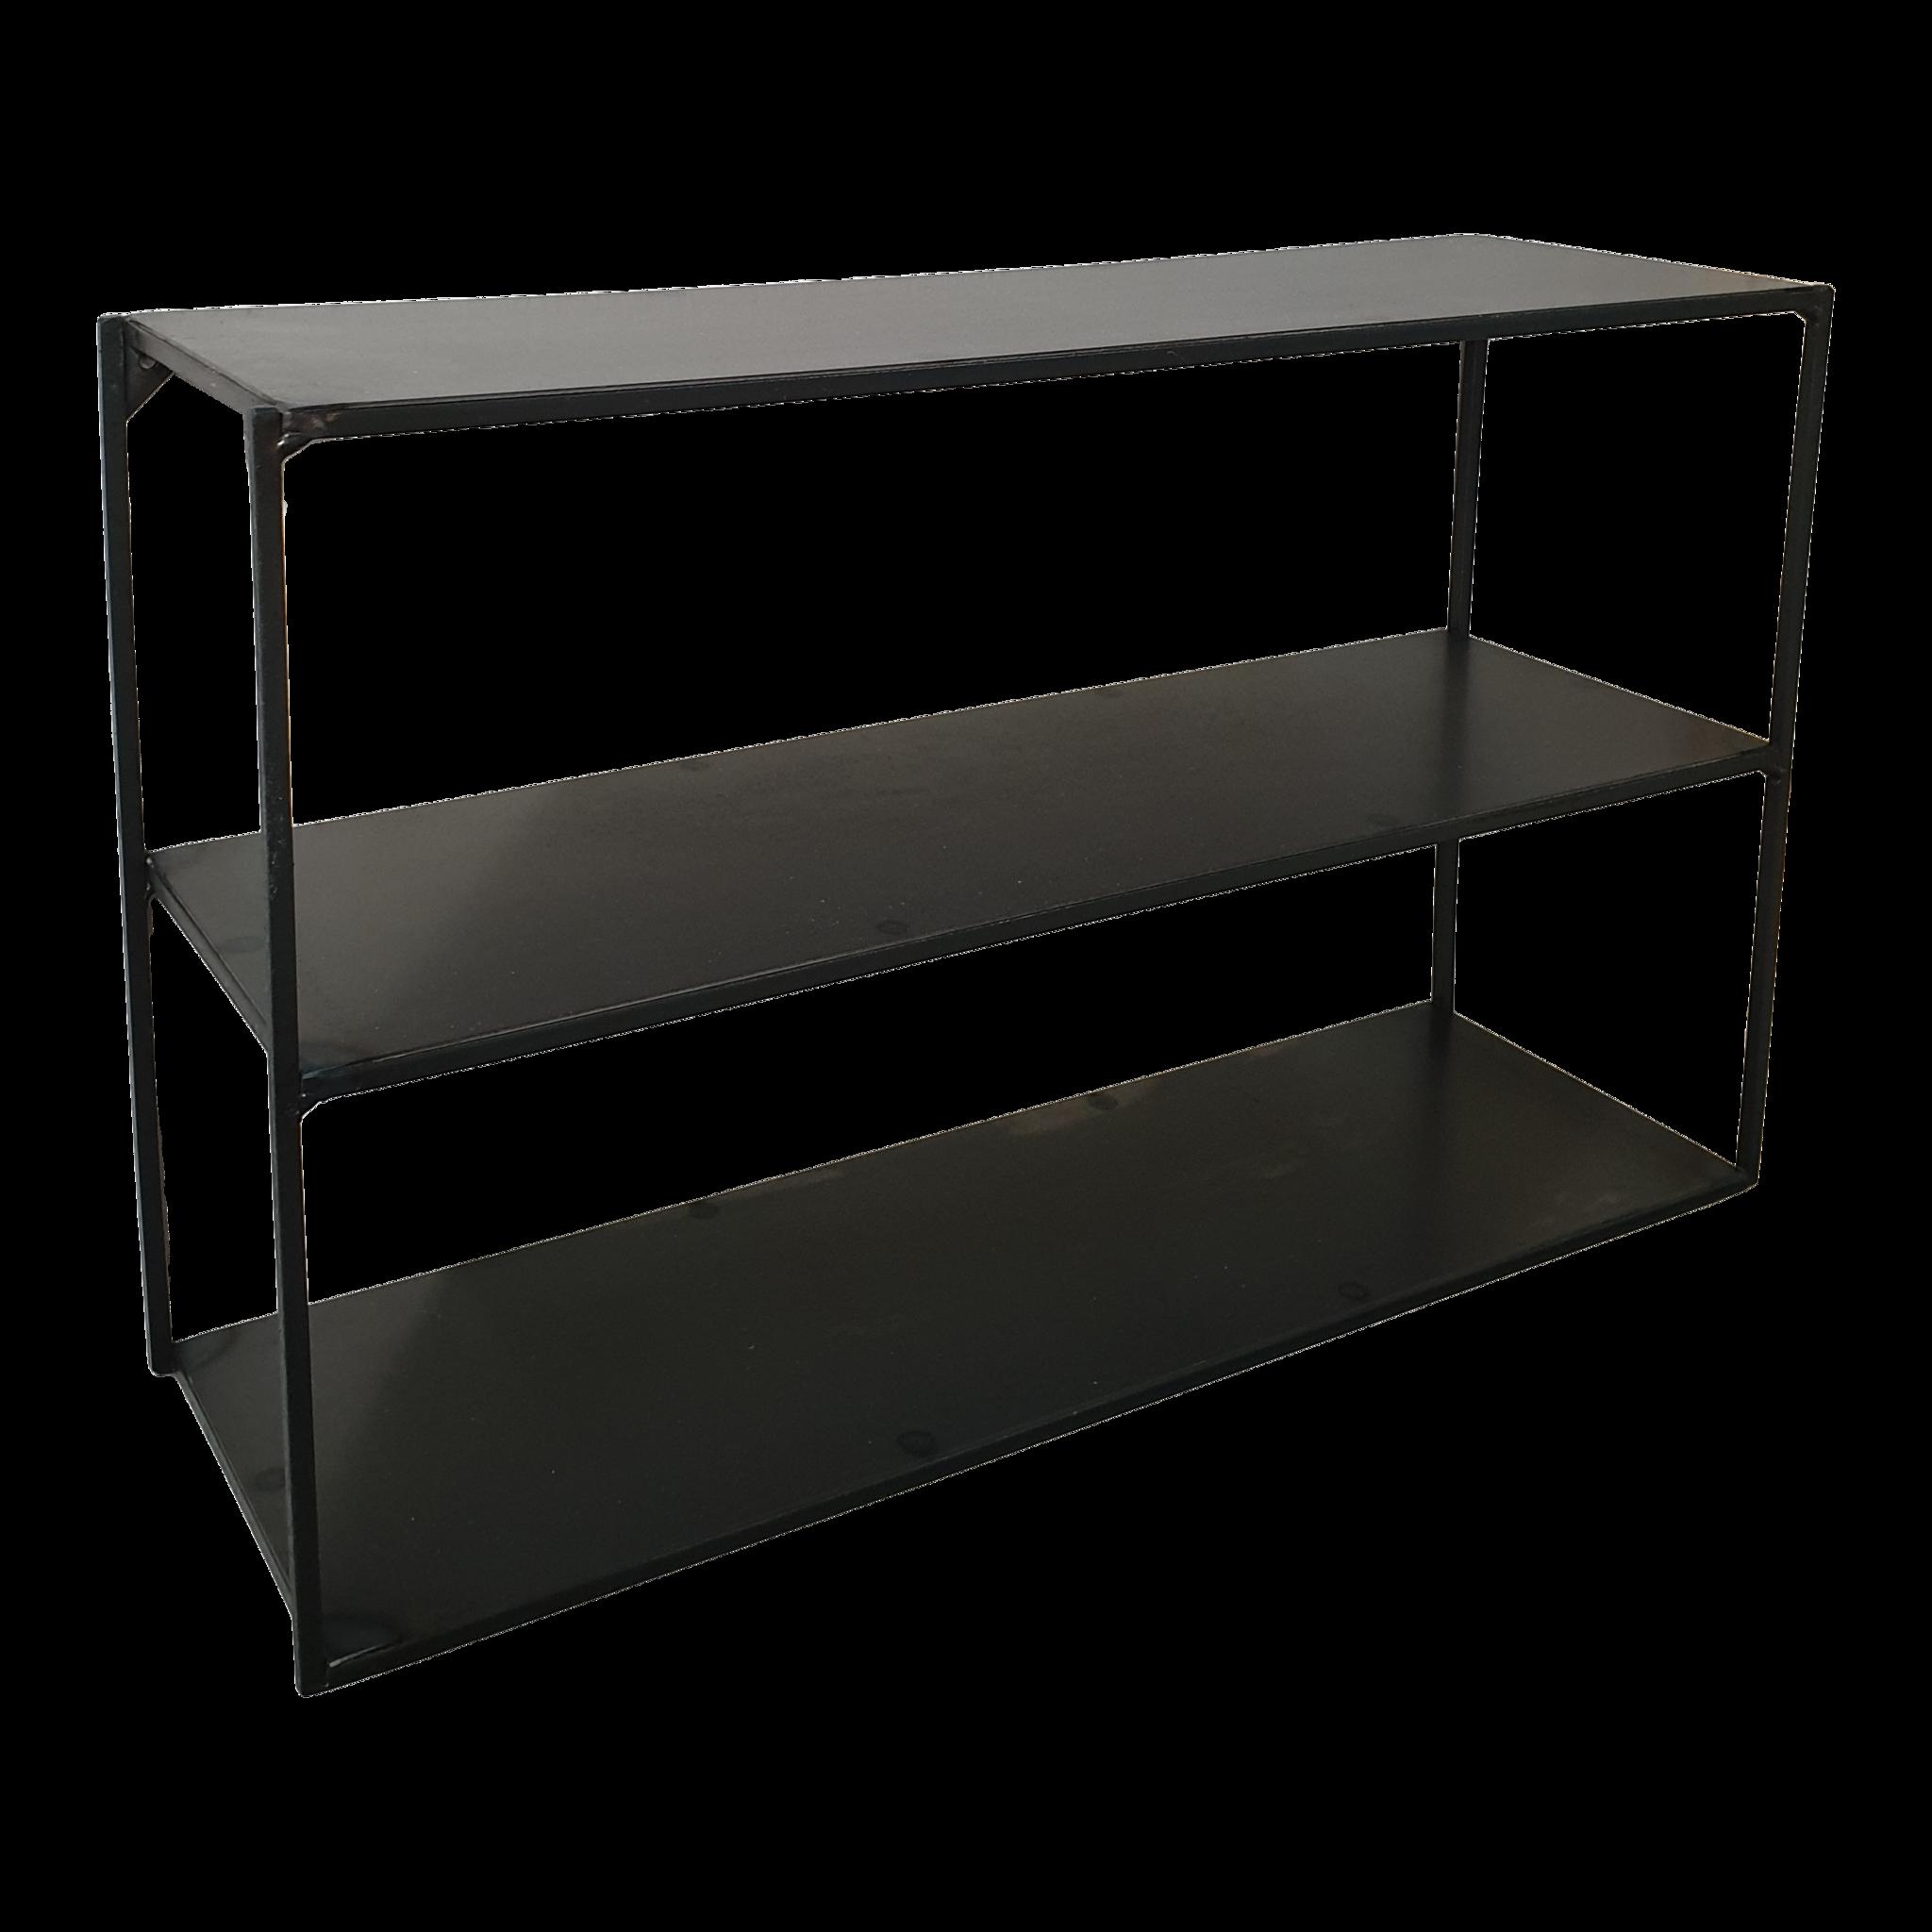 Stoer Metaal wall shelf Lowie, metal